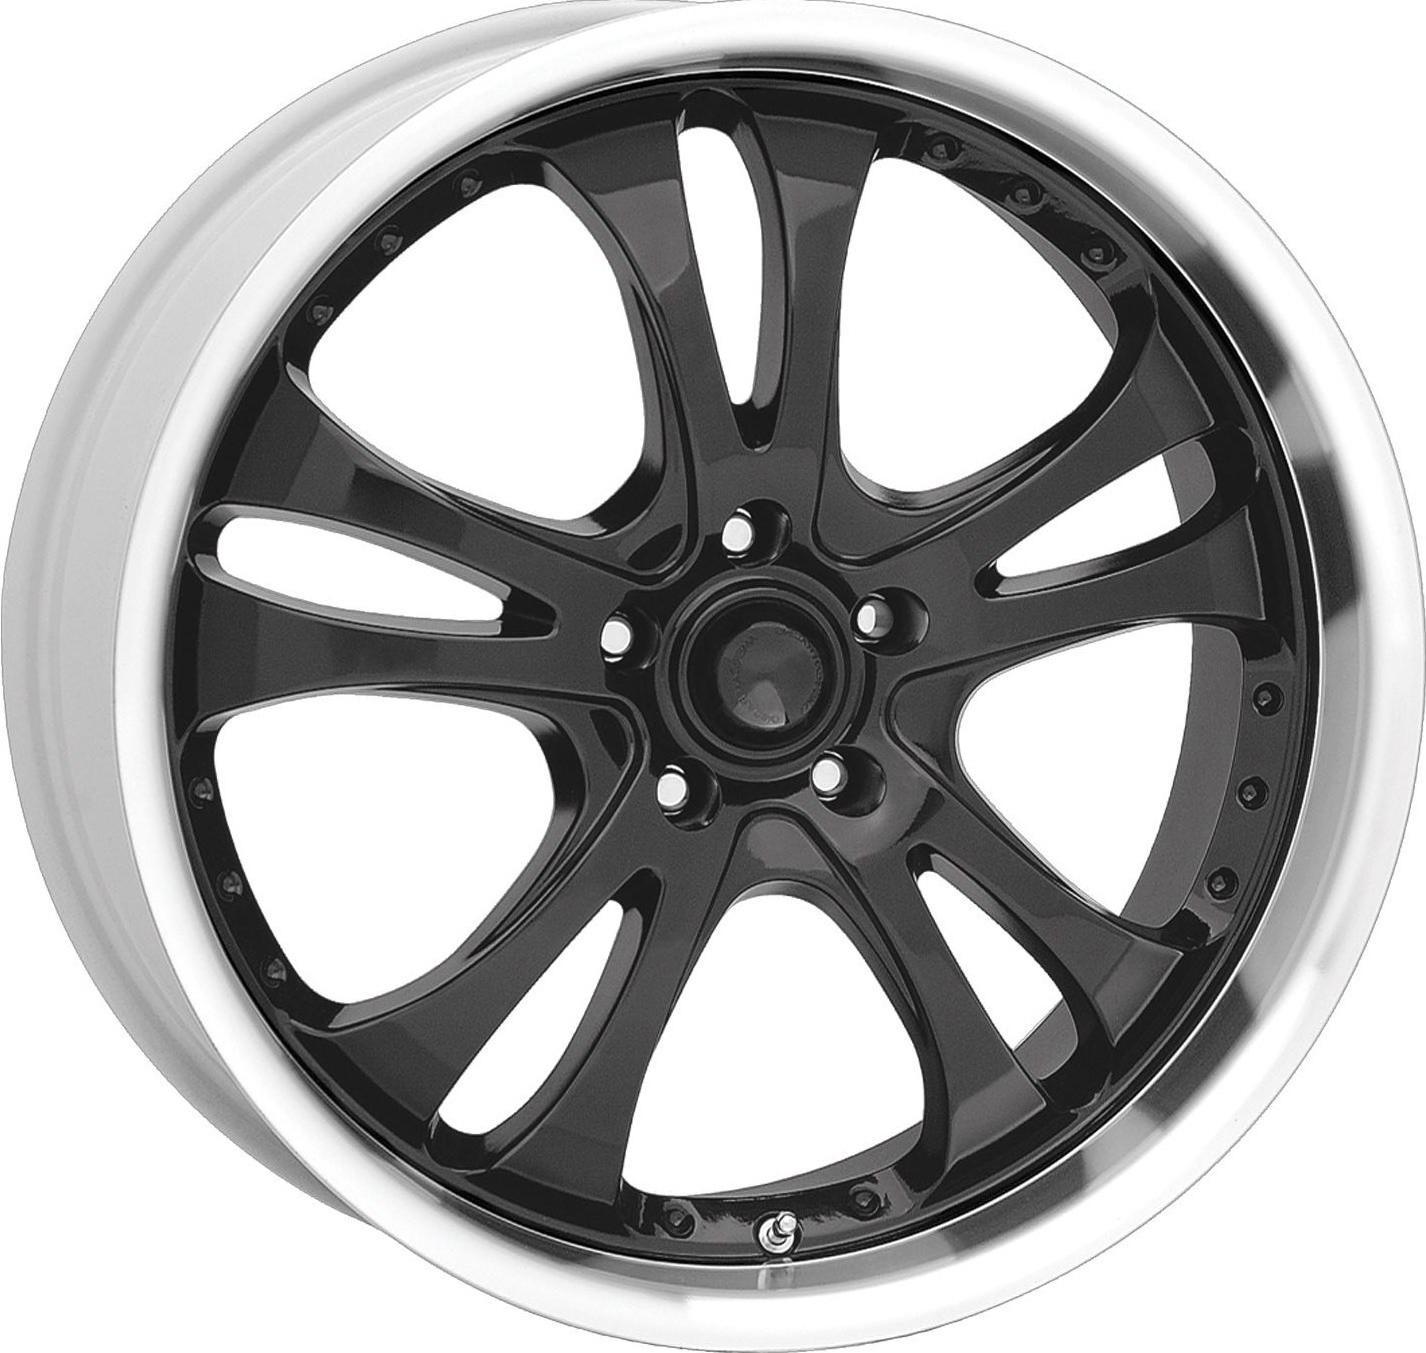 16 American Racing Casino Wheels Rims 16x7 5x115 42mm